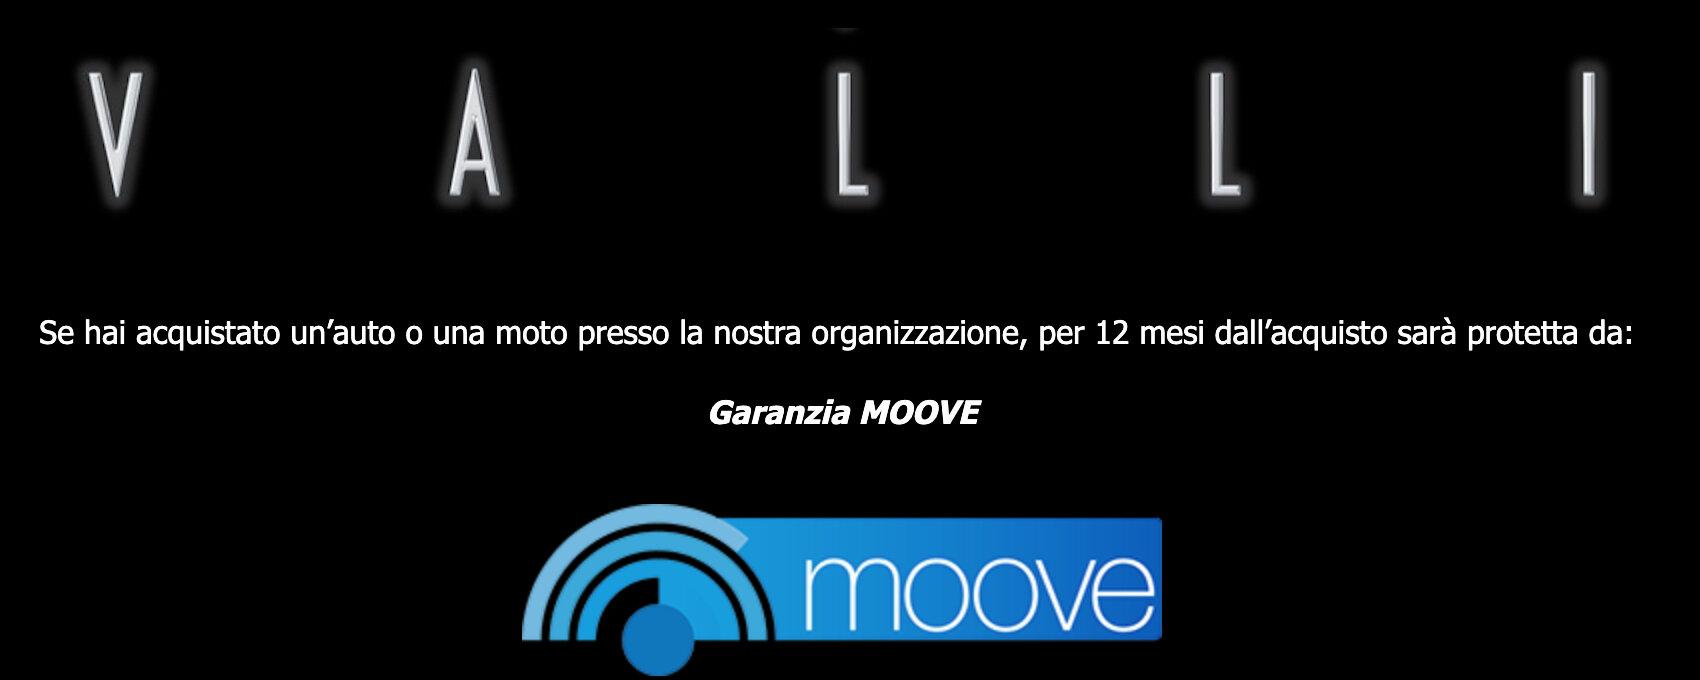 #vallistore #moove